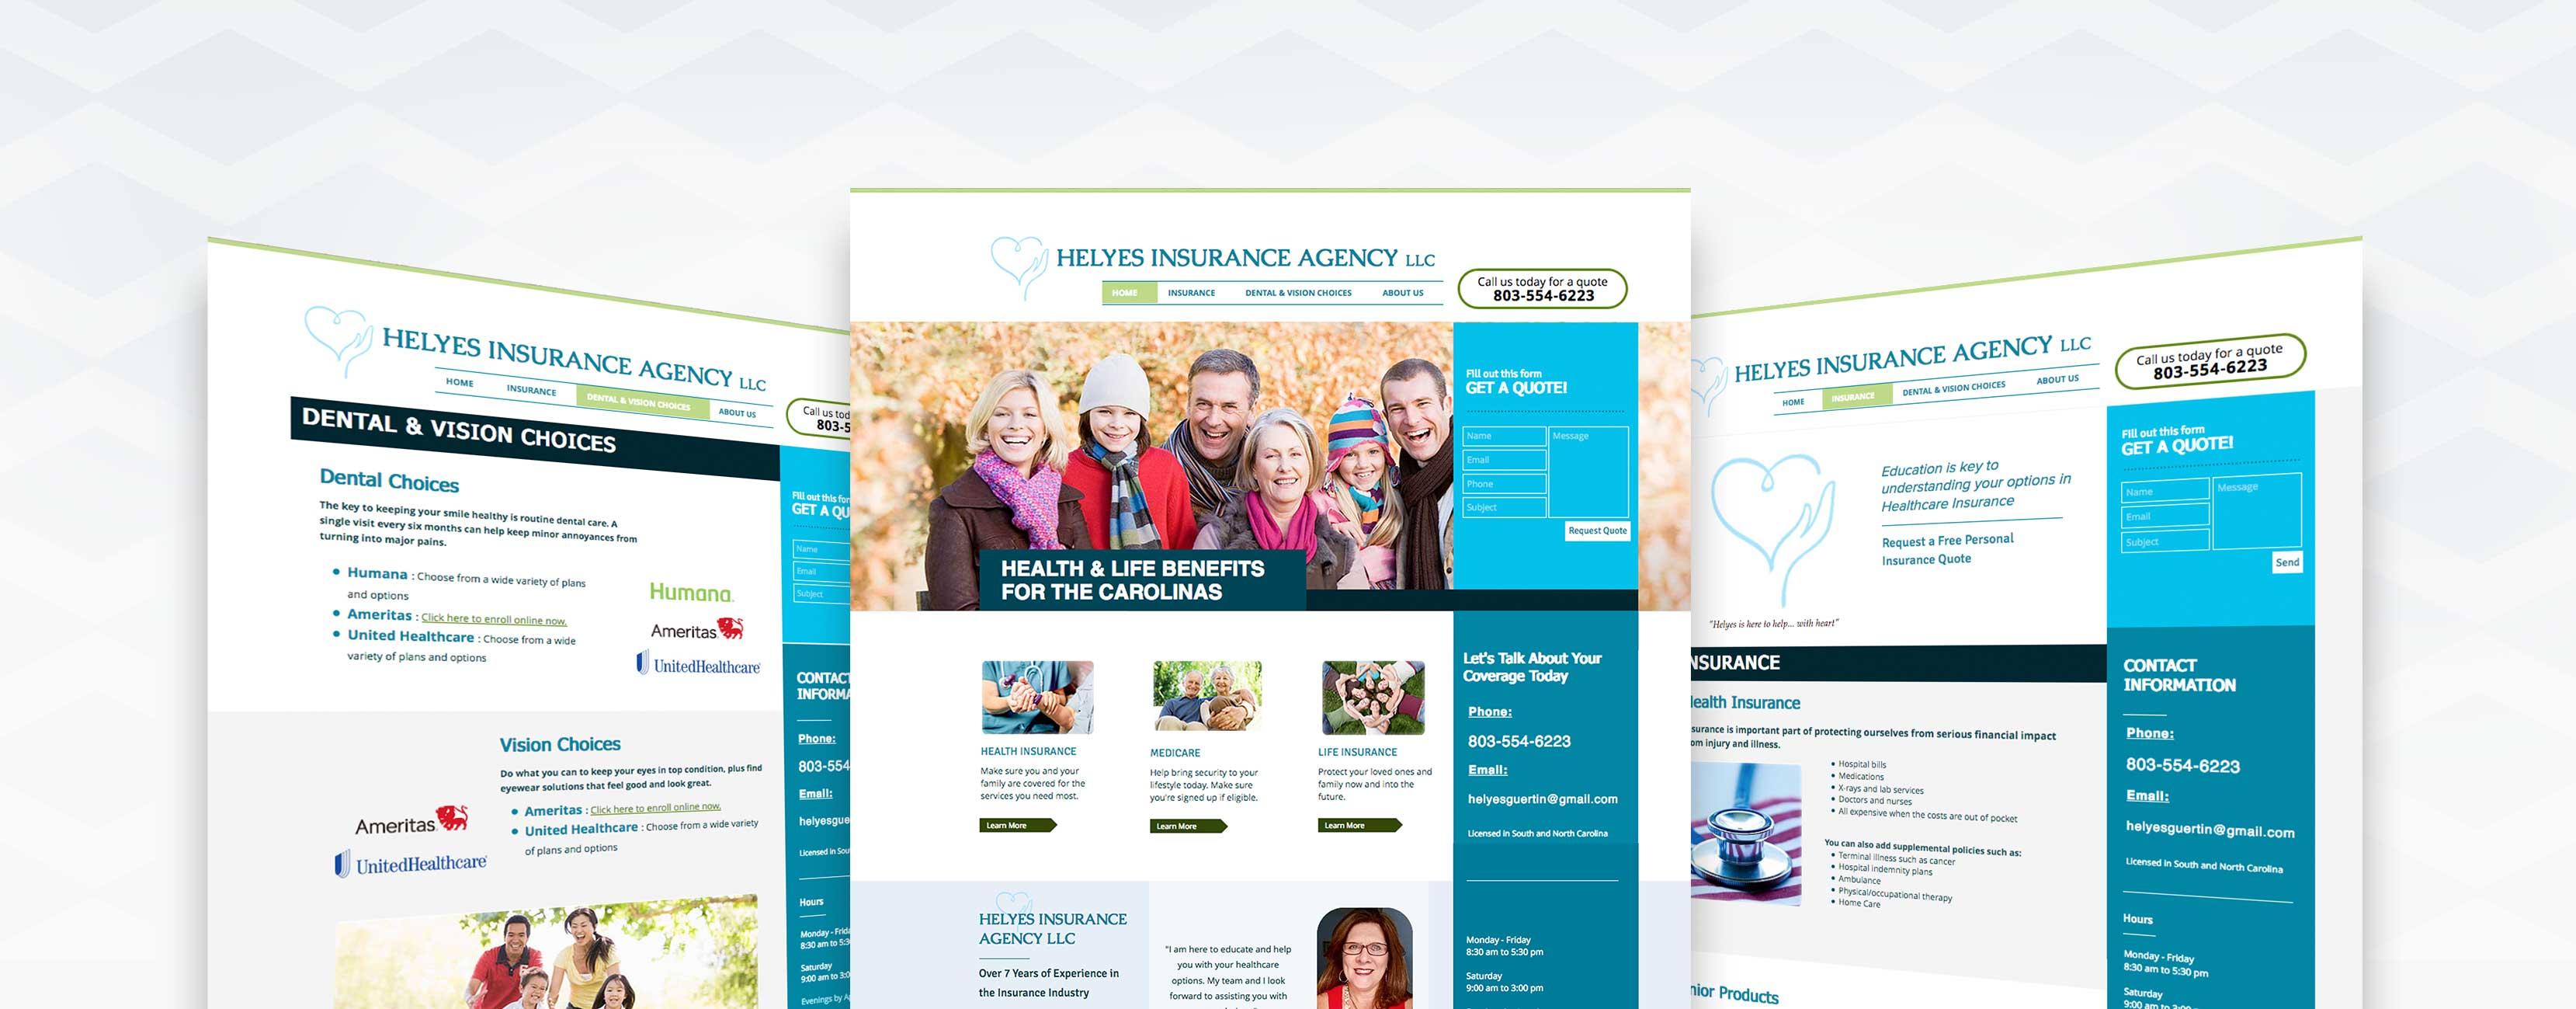 Helyes Insurance Agency Website